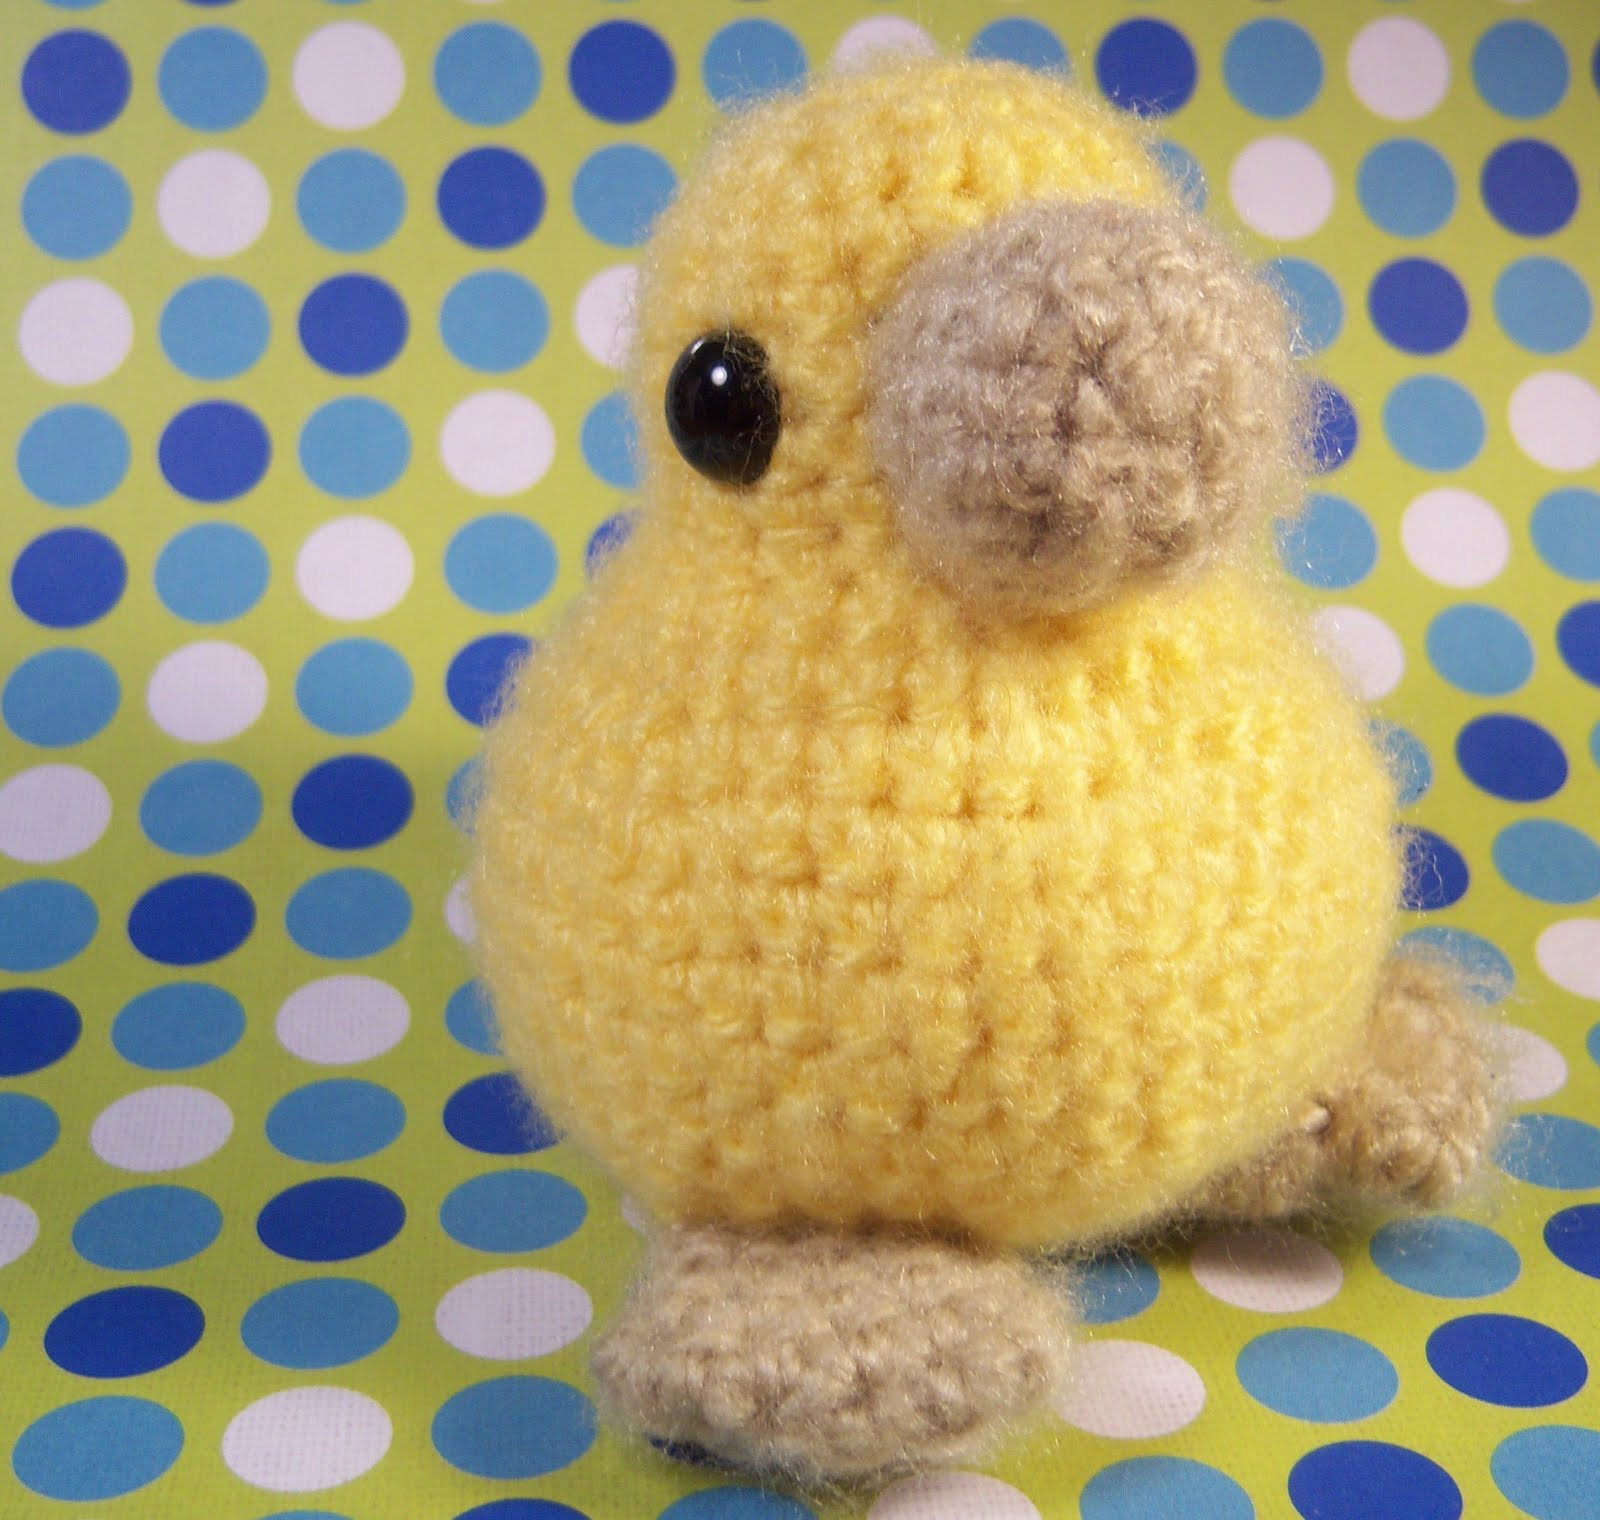 Amigurumi Baby Chicks : 2000 Free Amigurumi Patterns: Baby Chick